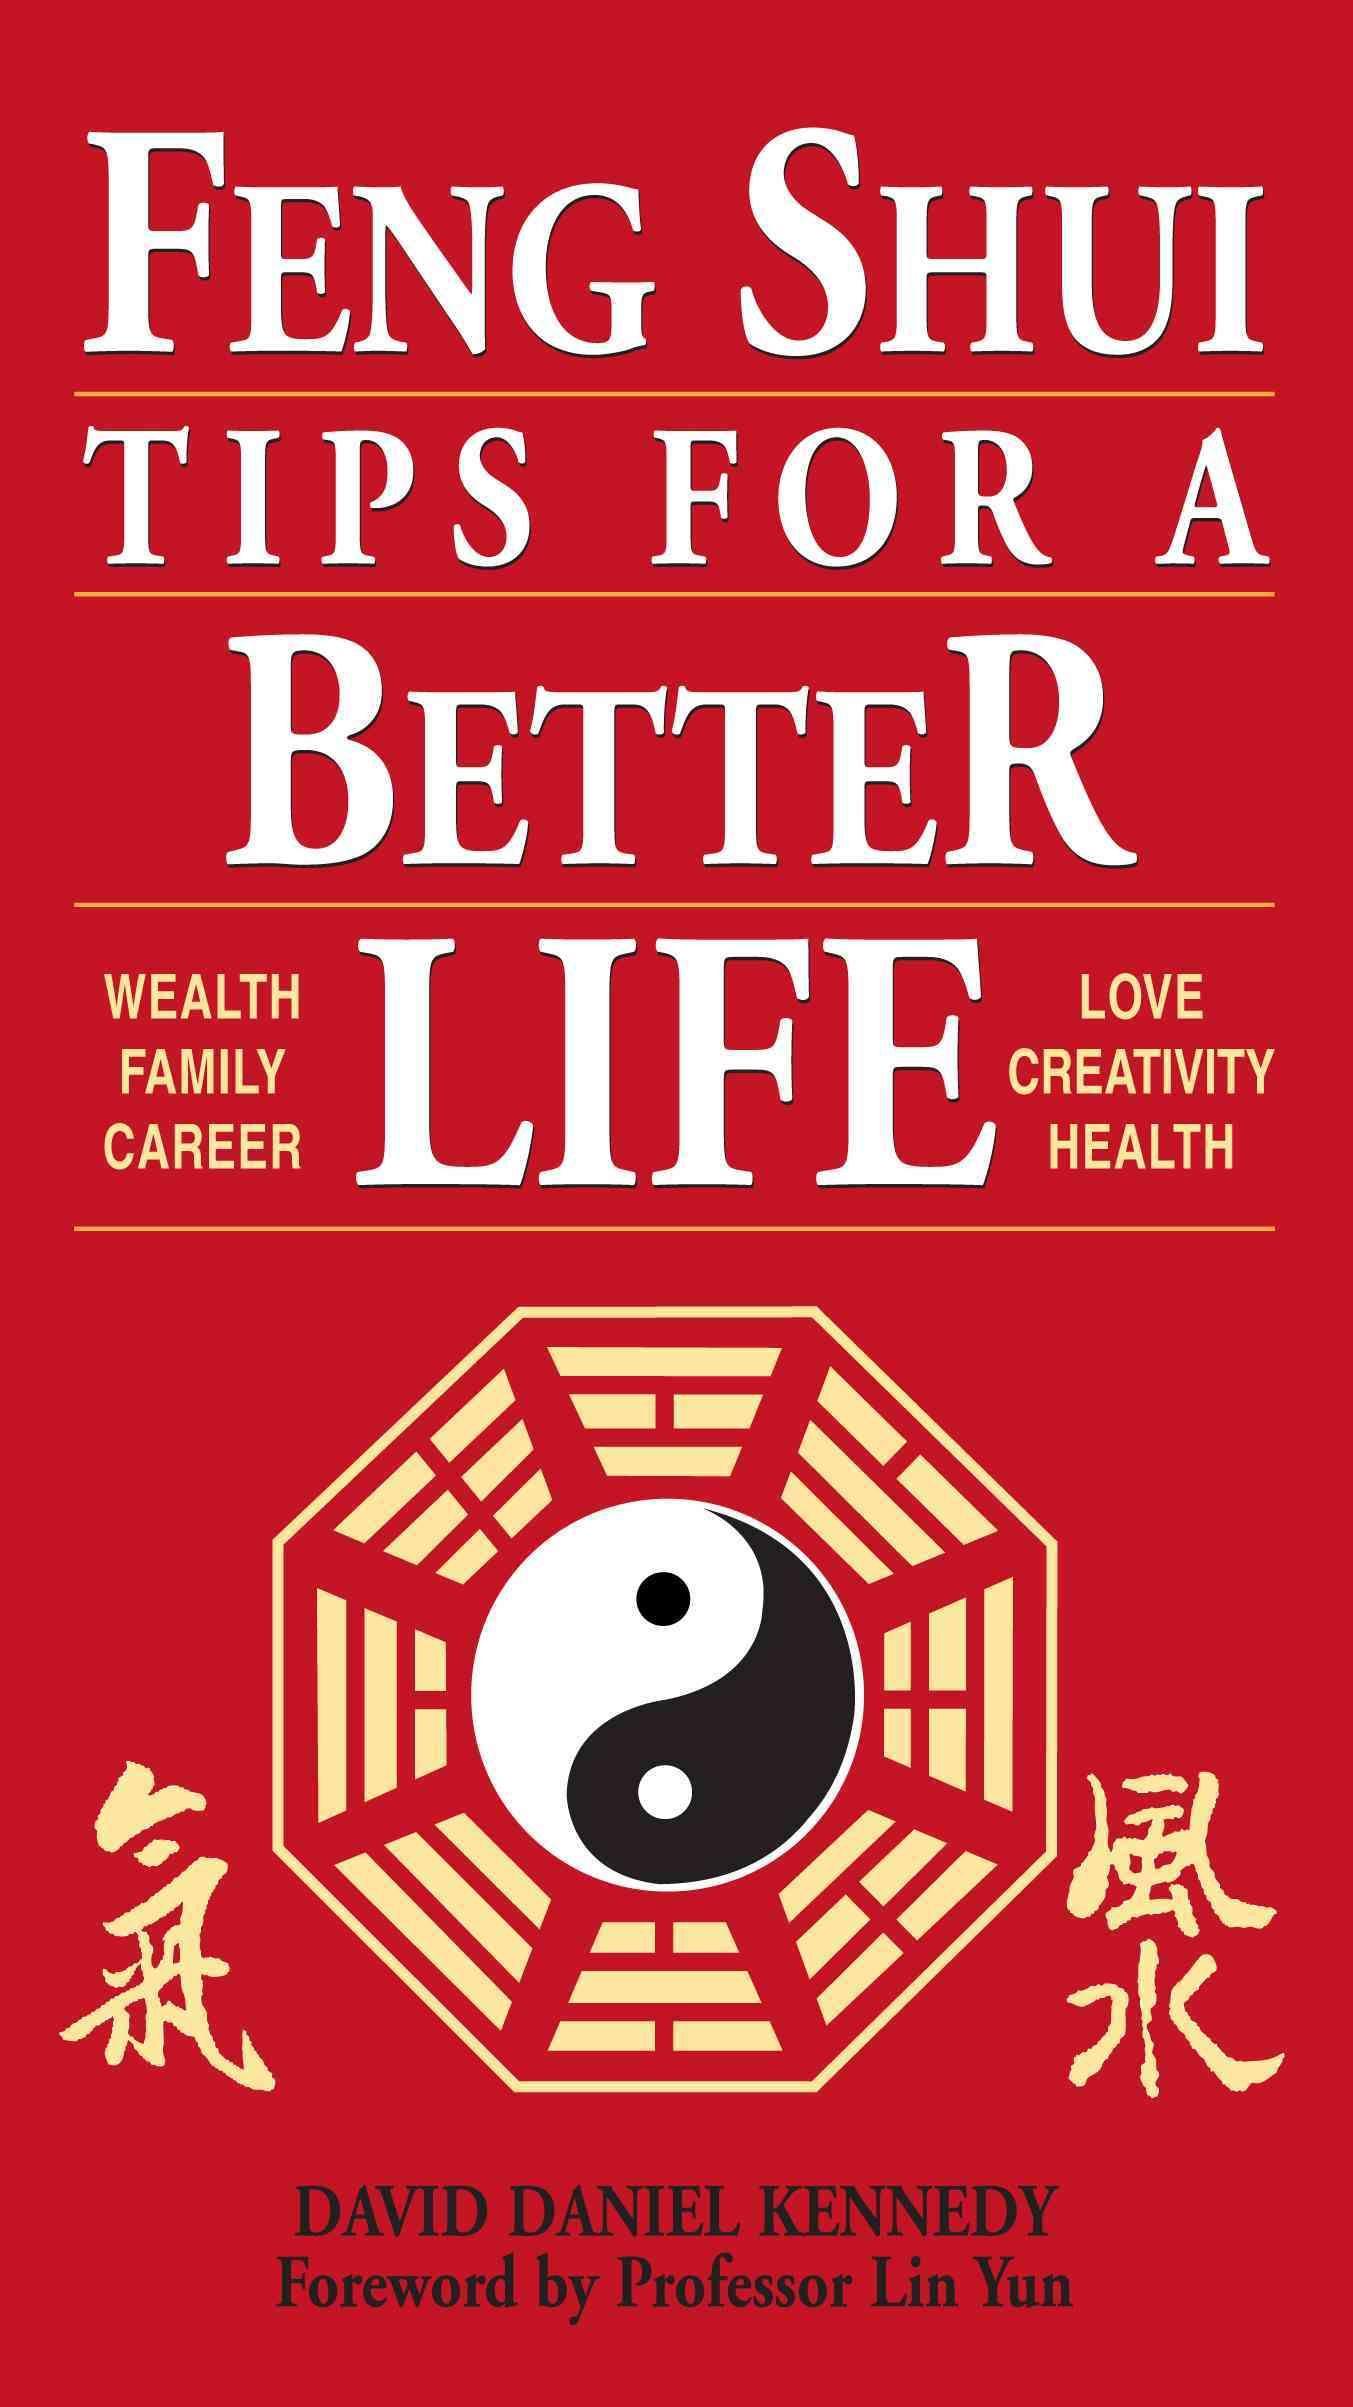 Feng Shui Tips for a Better Life Wealth, Family, Career